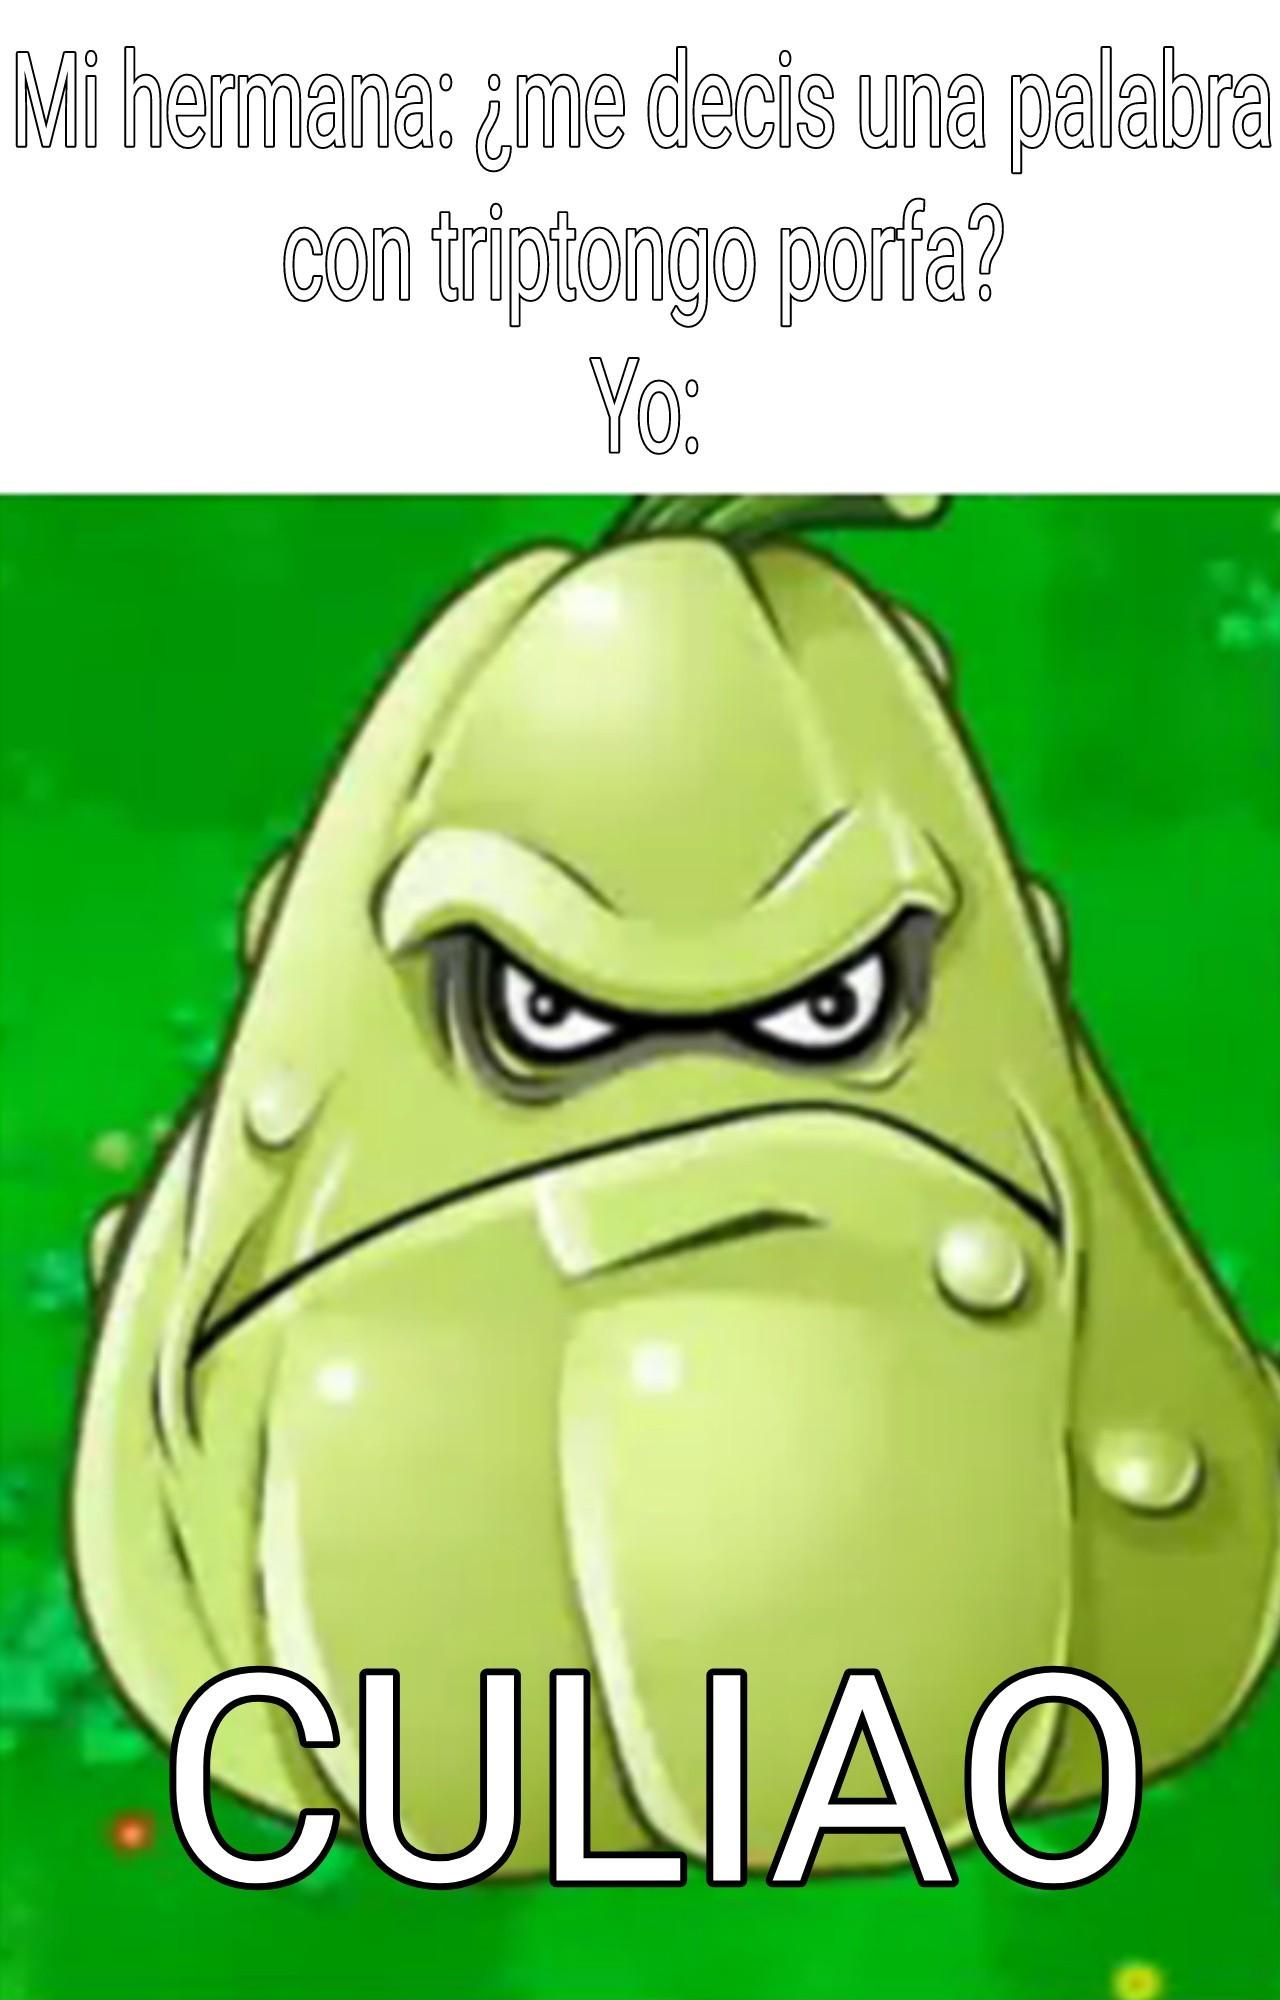 Me pasó ayer y lo hice meme XDD :yaoming: :grin: